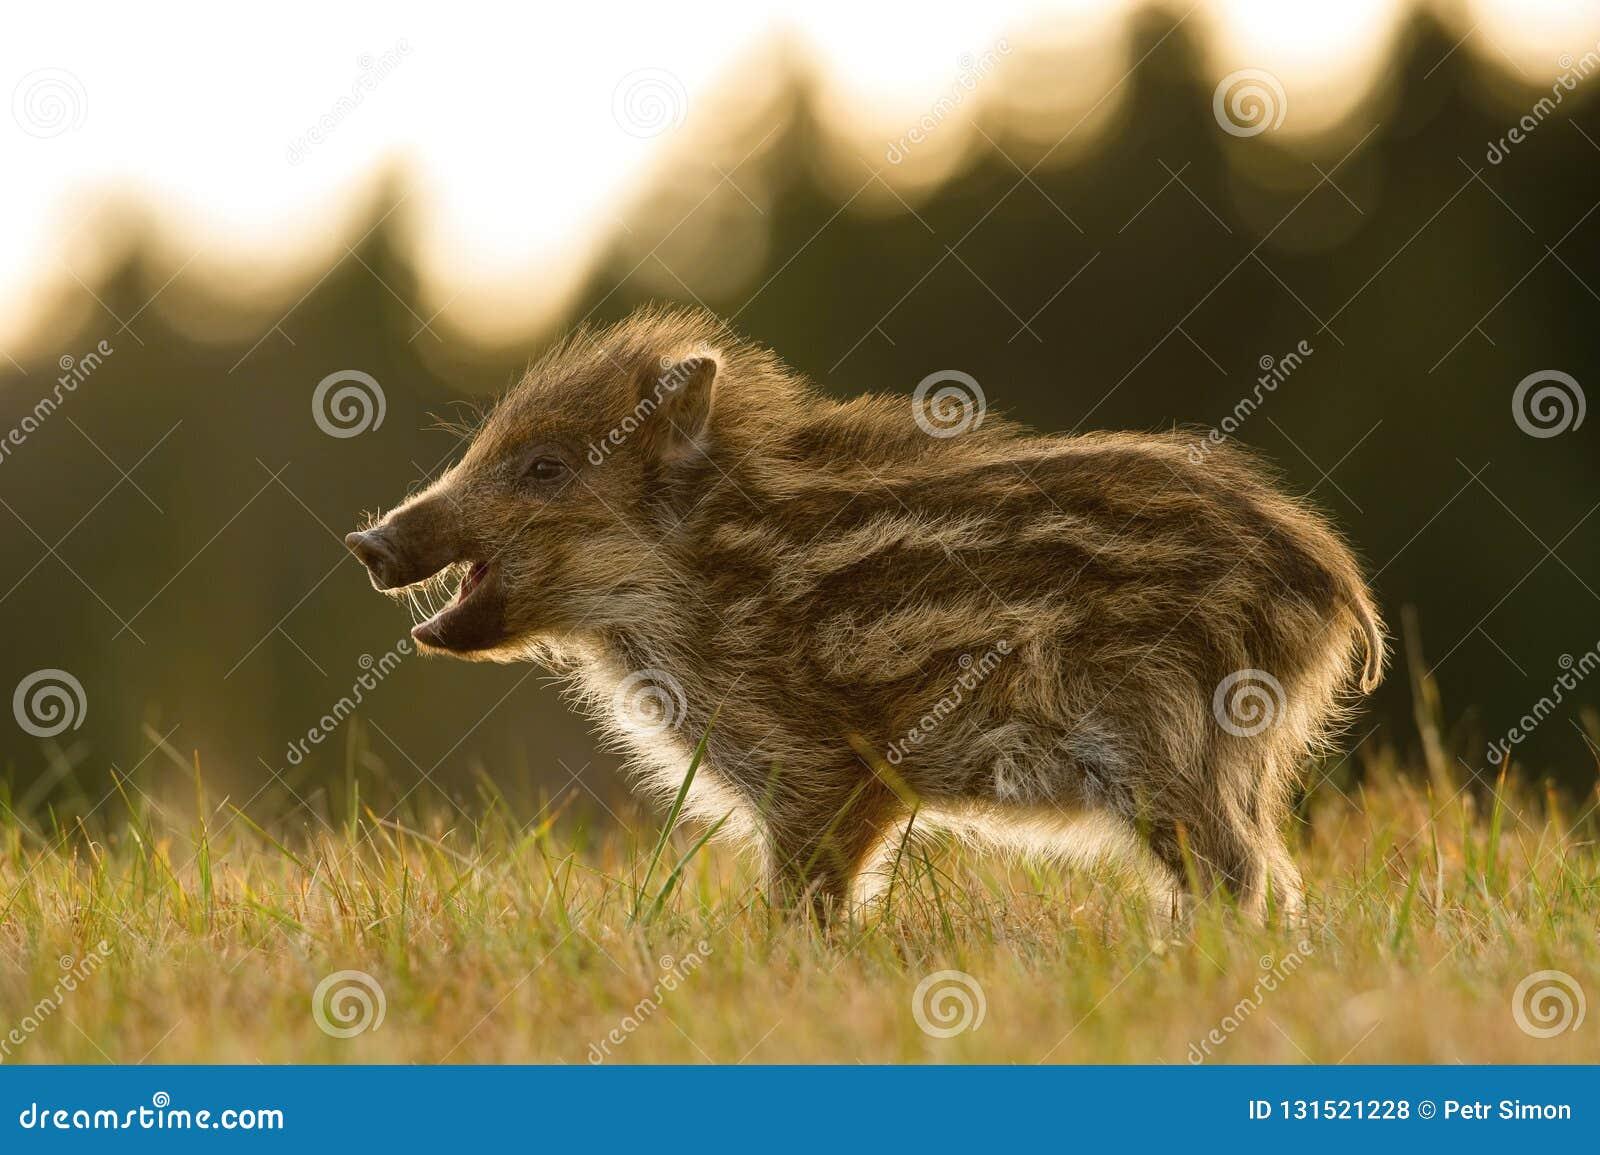 The Wild Boar piglet, sus scrofa